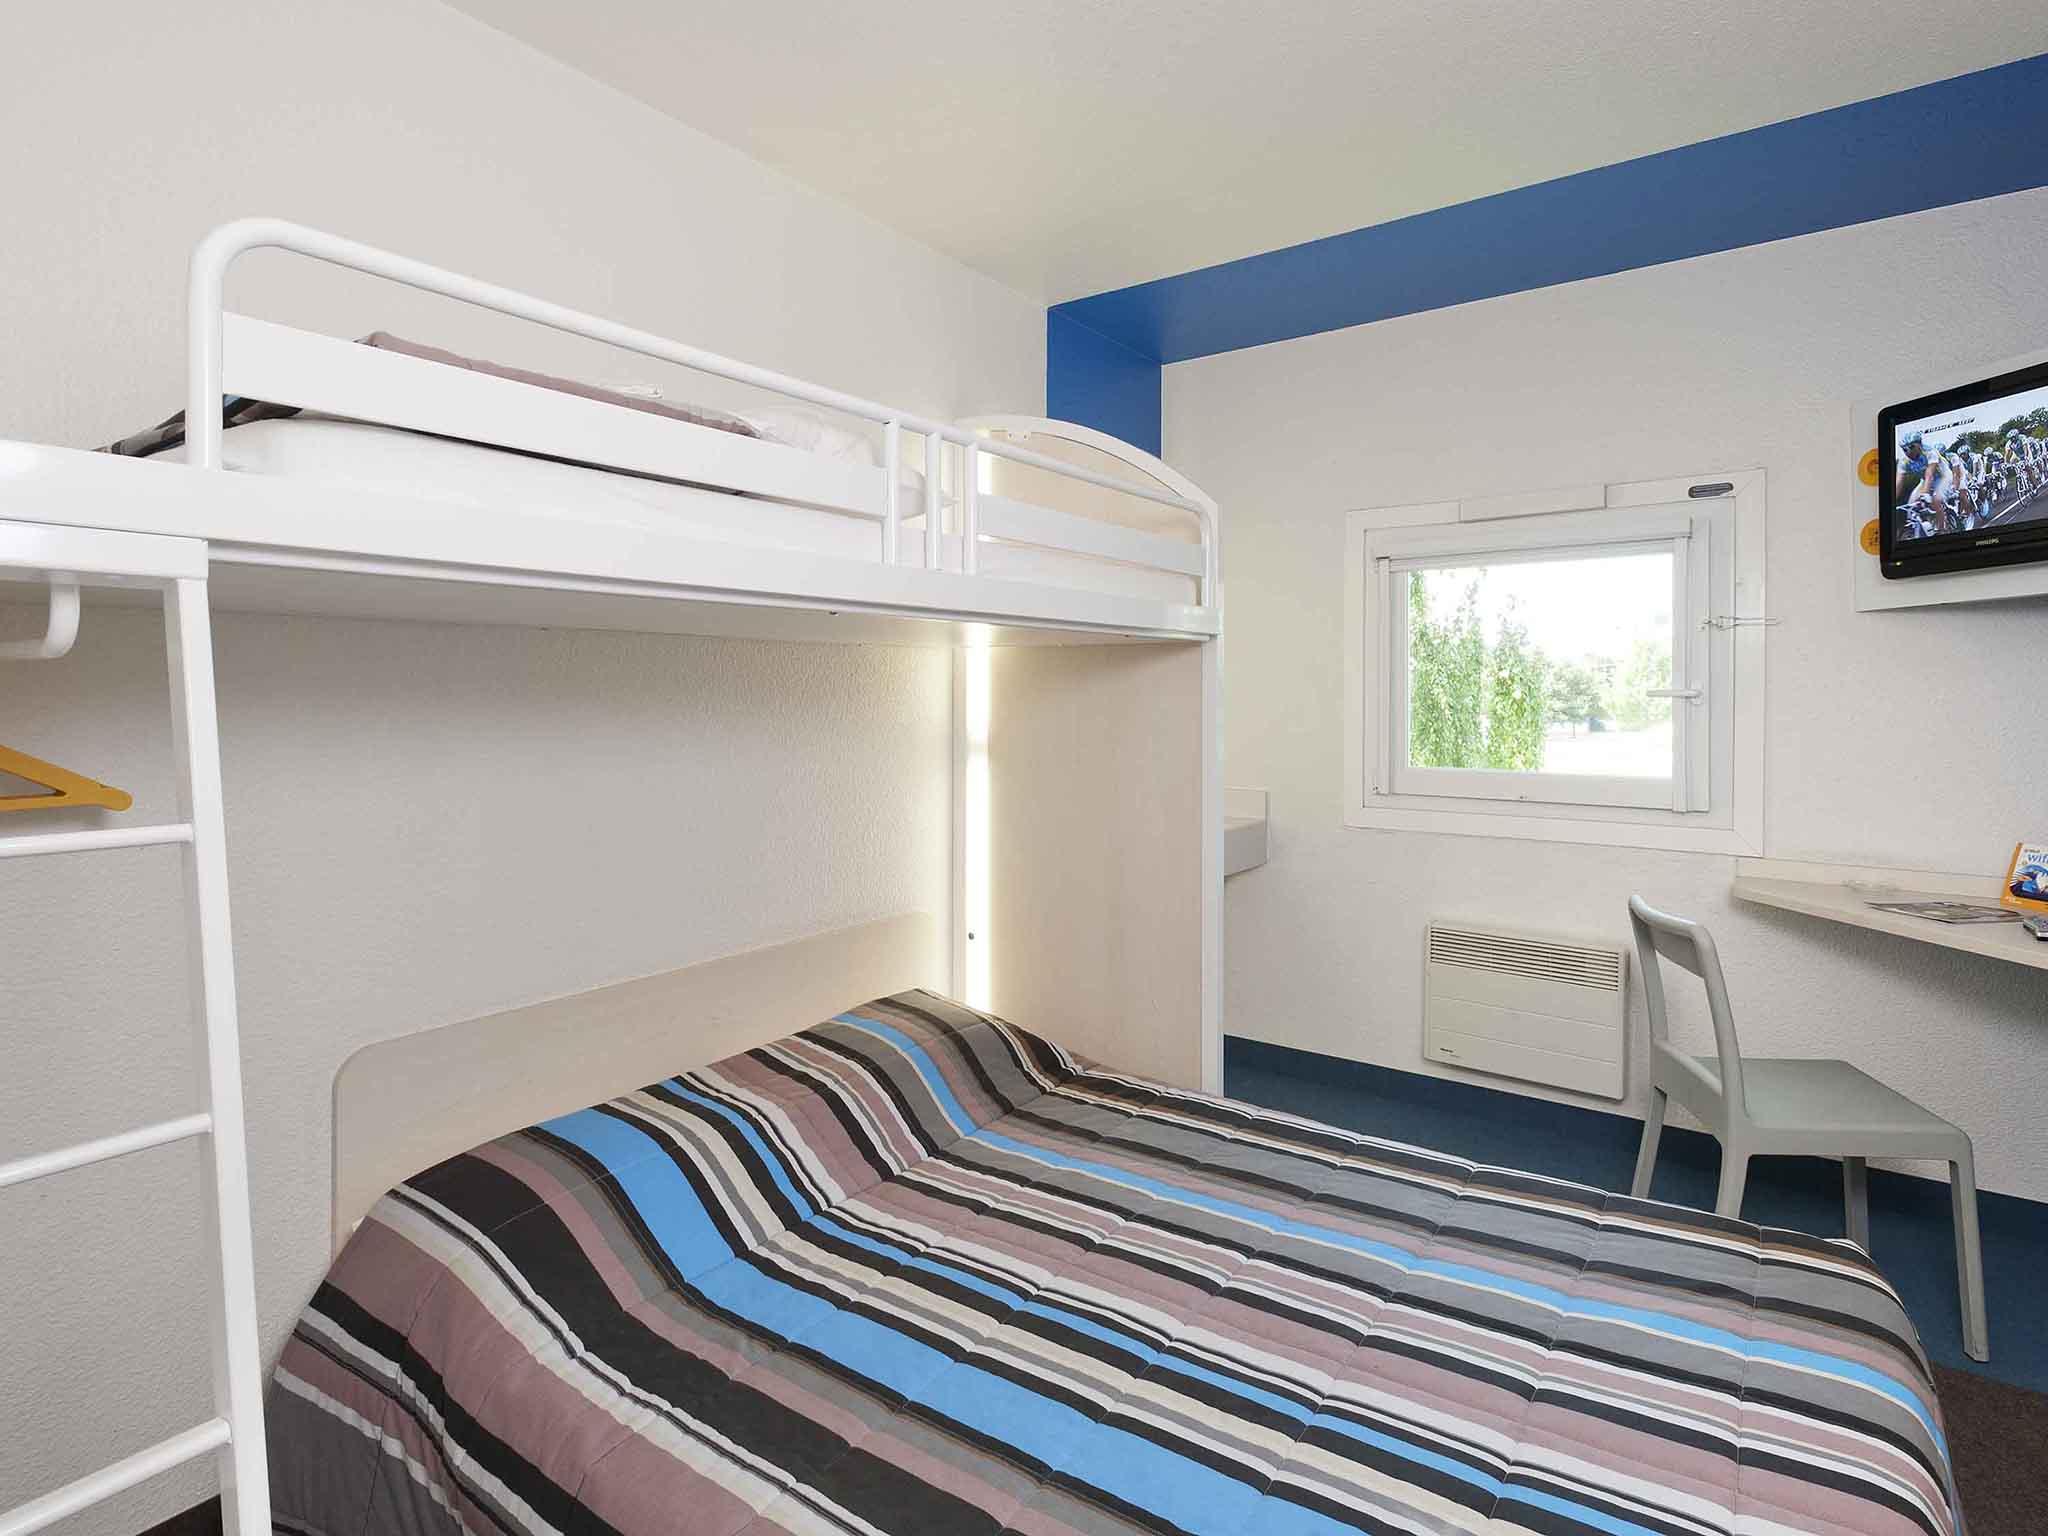 Hotell – hotelF1 Reims Tinqueux